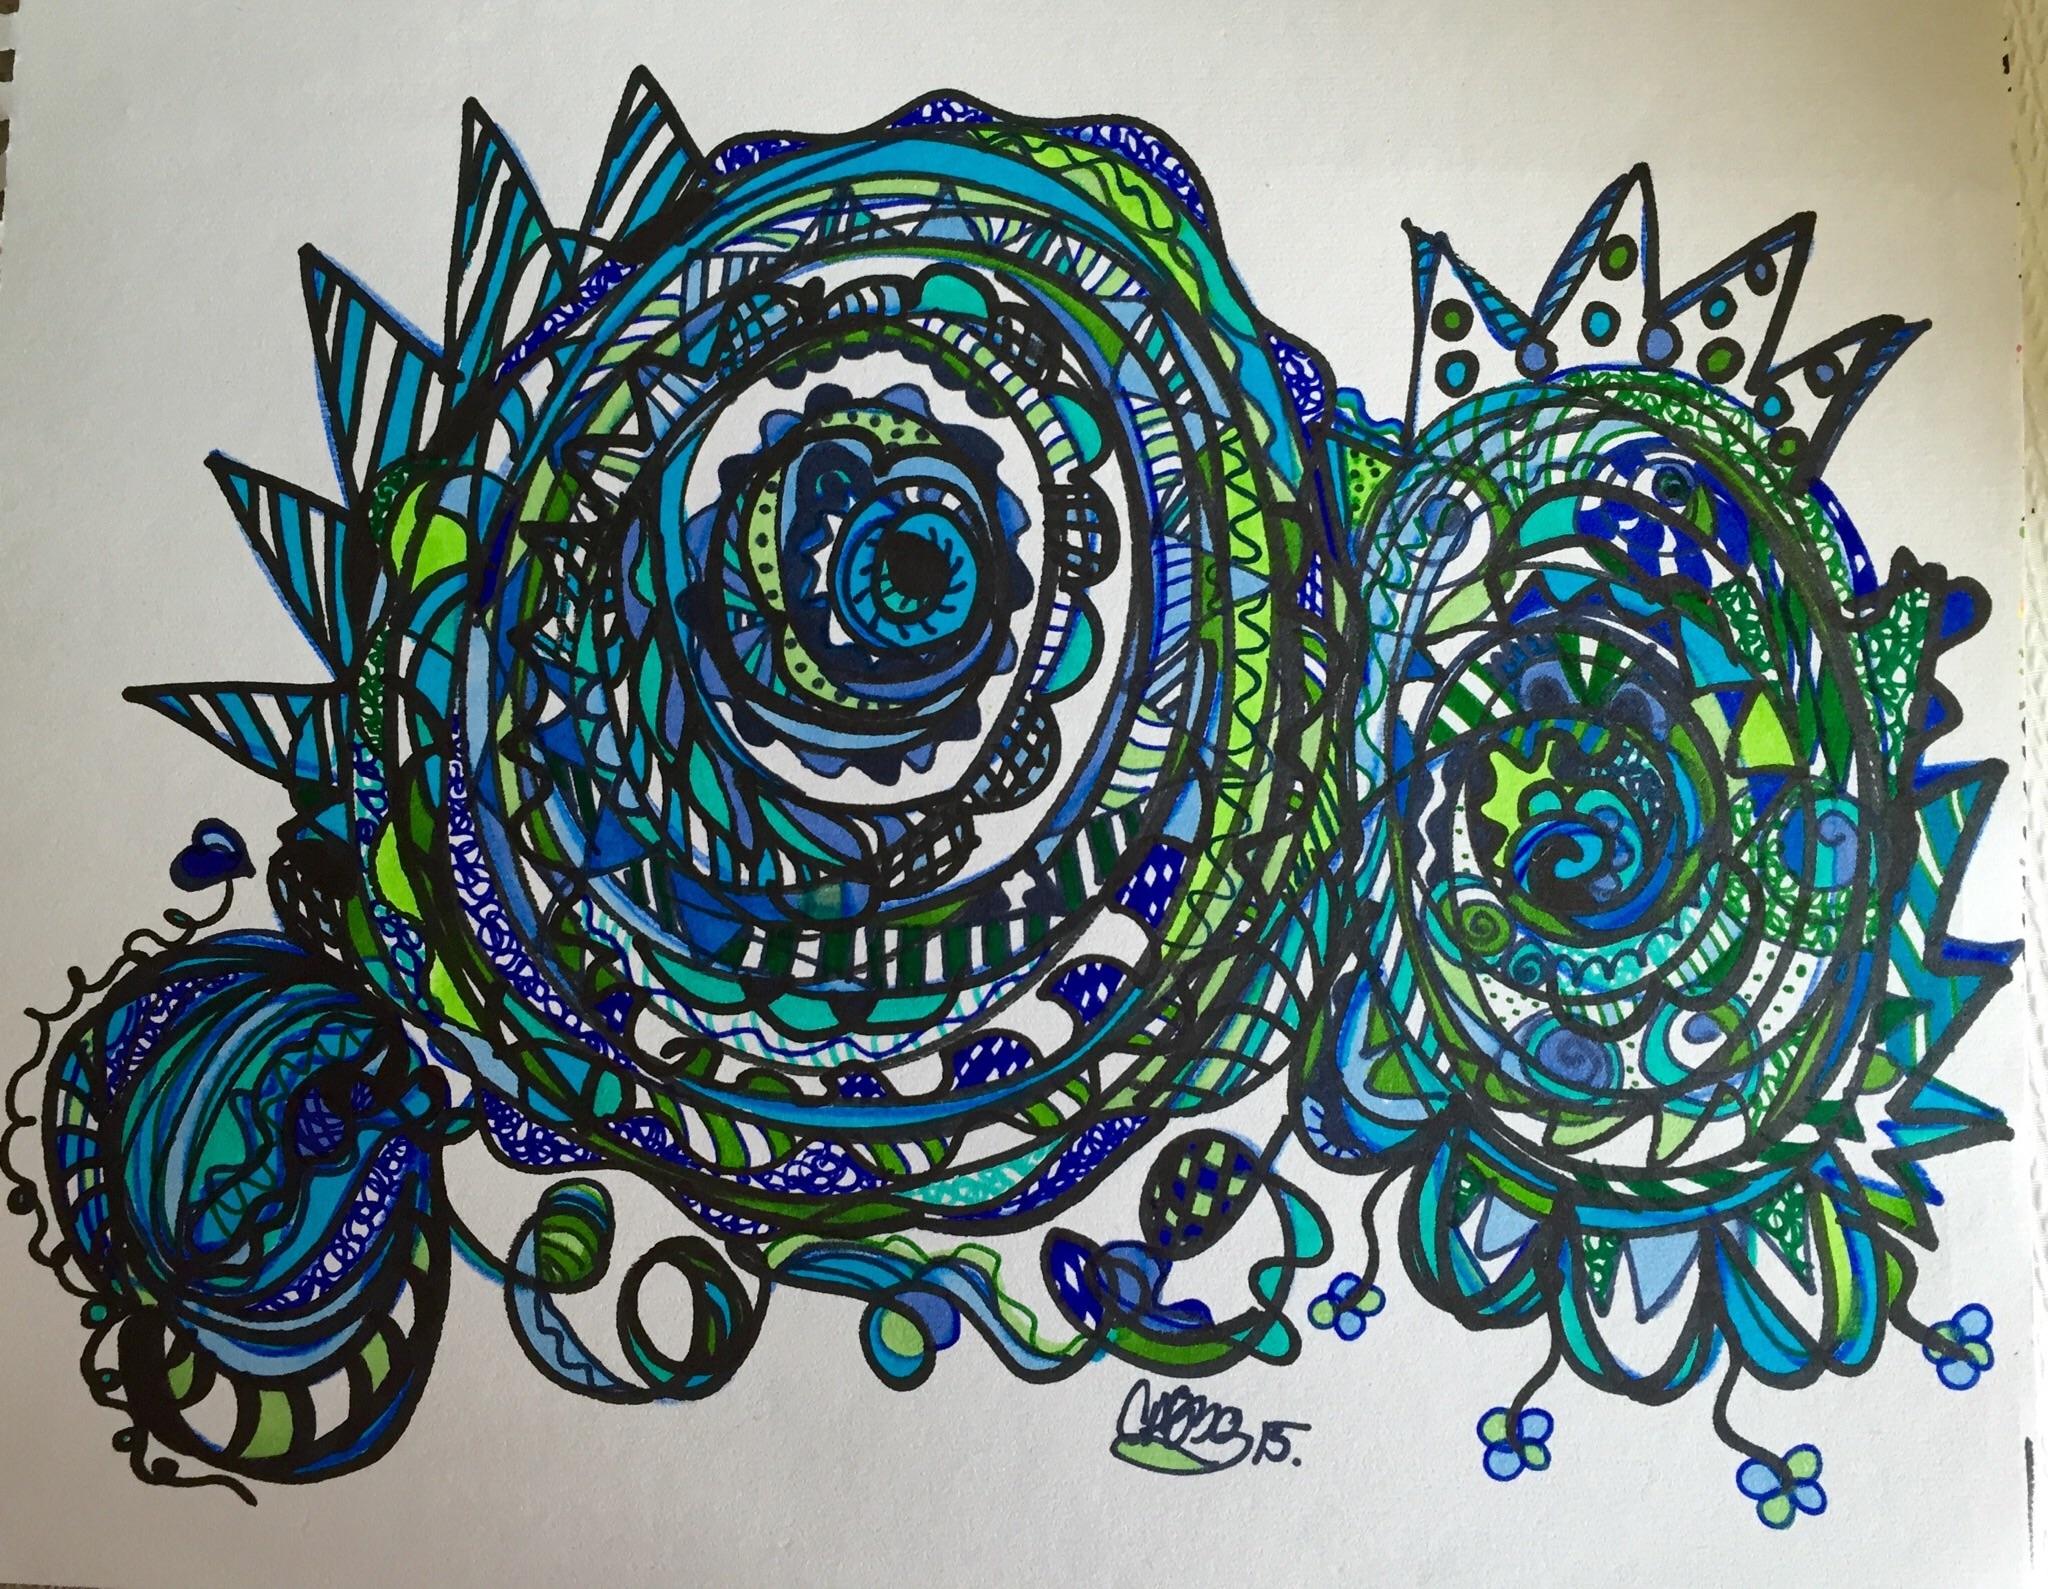 Fulatronik Art's Signature